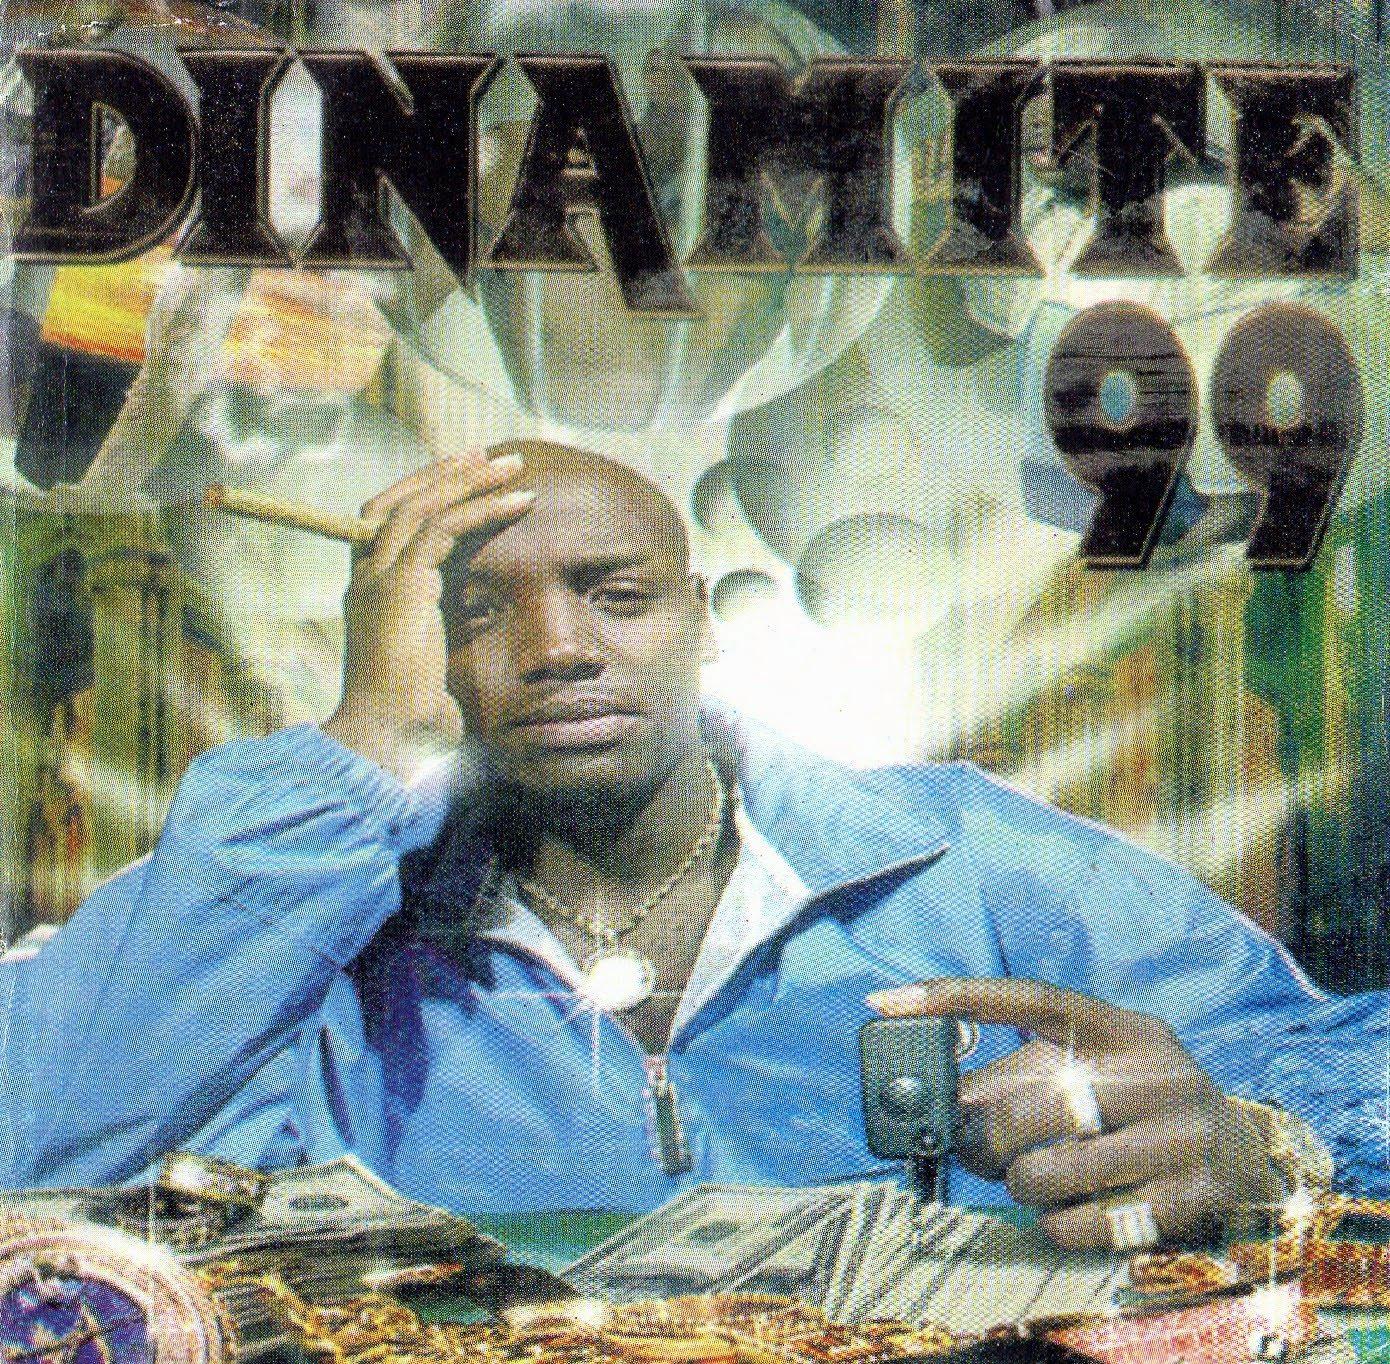 DINAMITE 99